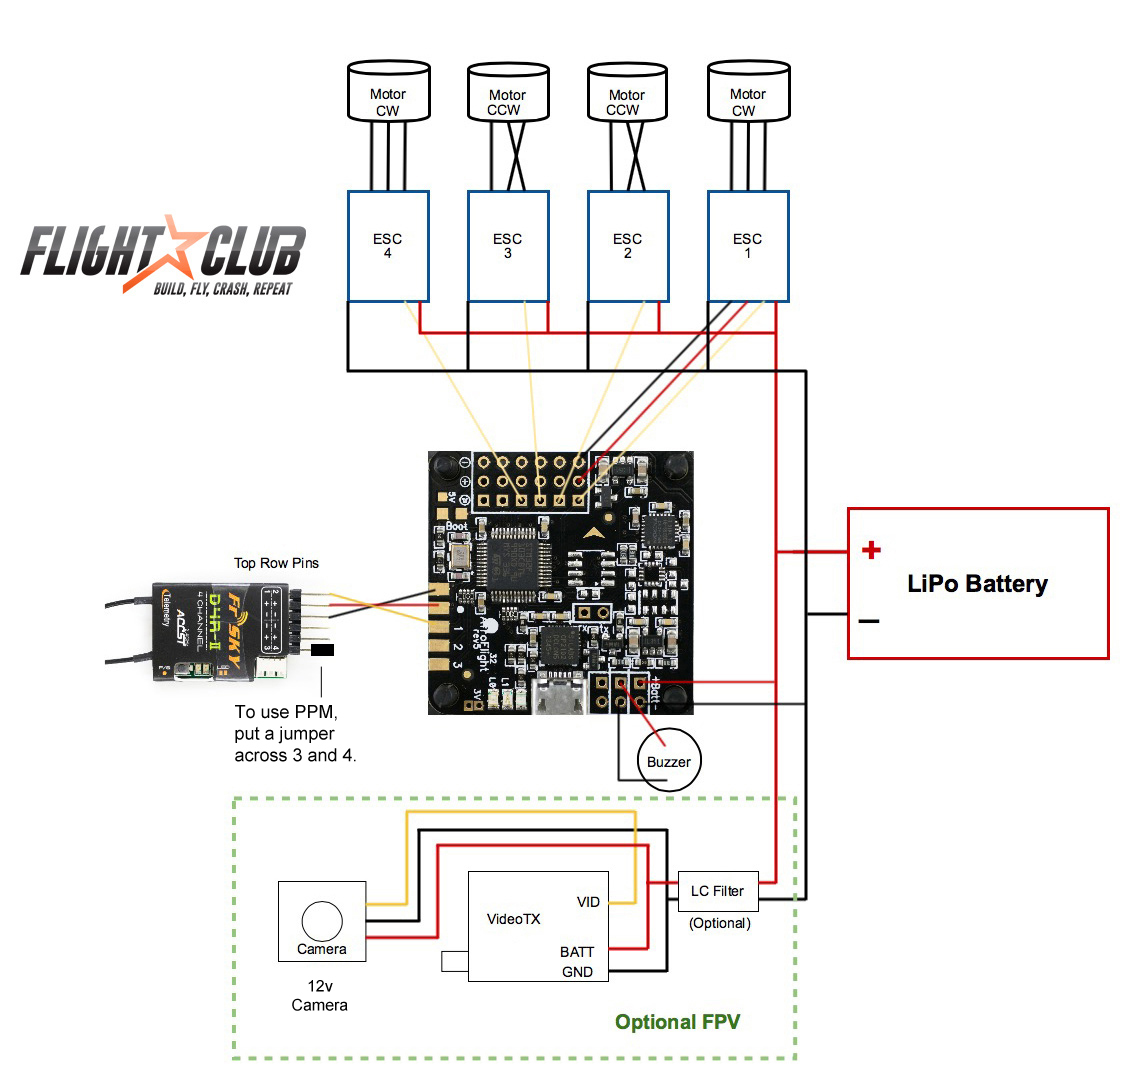 fpv quadcopter wiring diagram pioneer avh error 02 9e learn how to build best flightclub